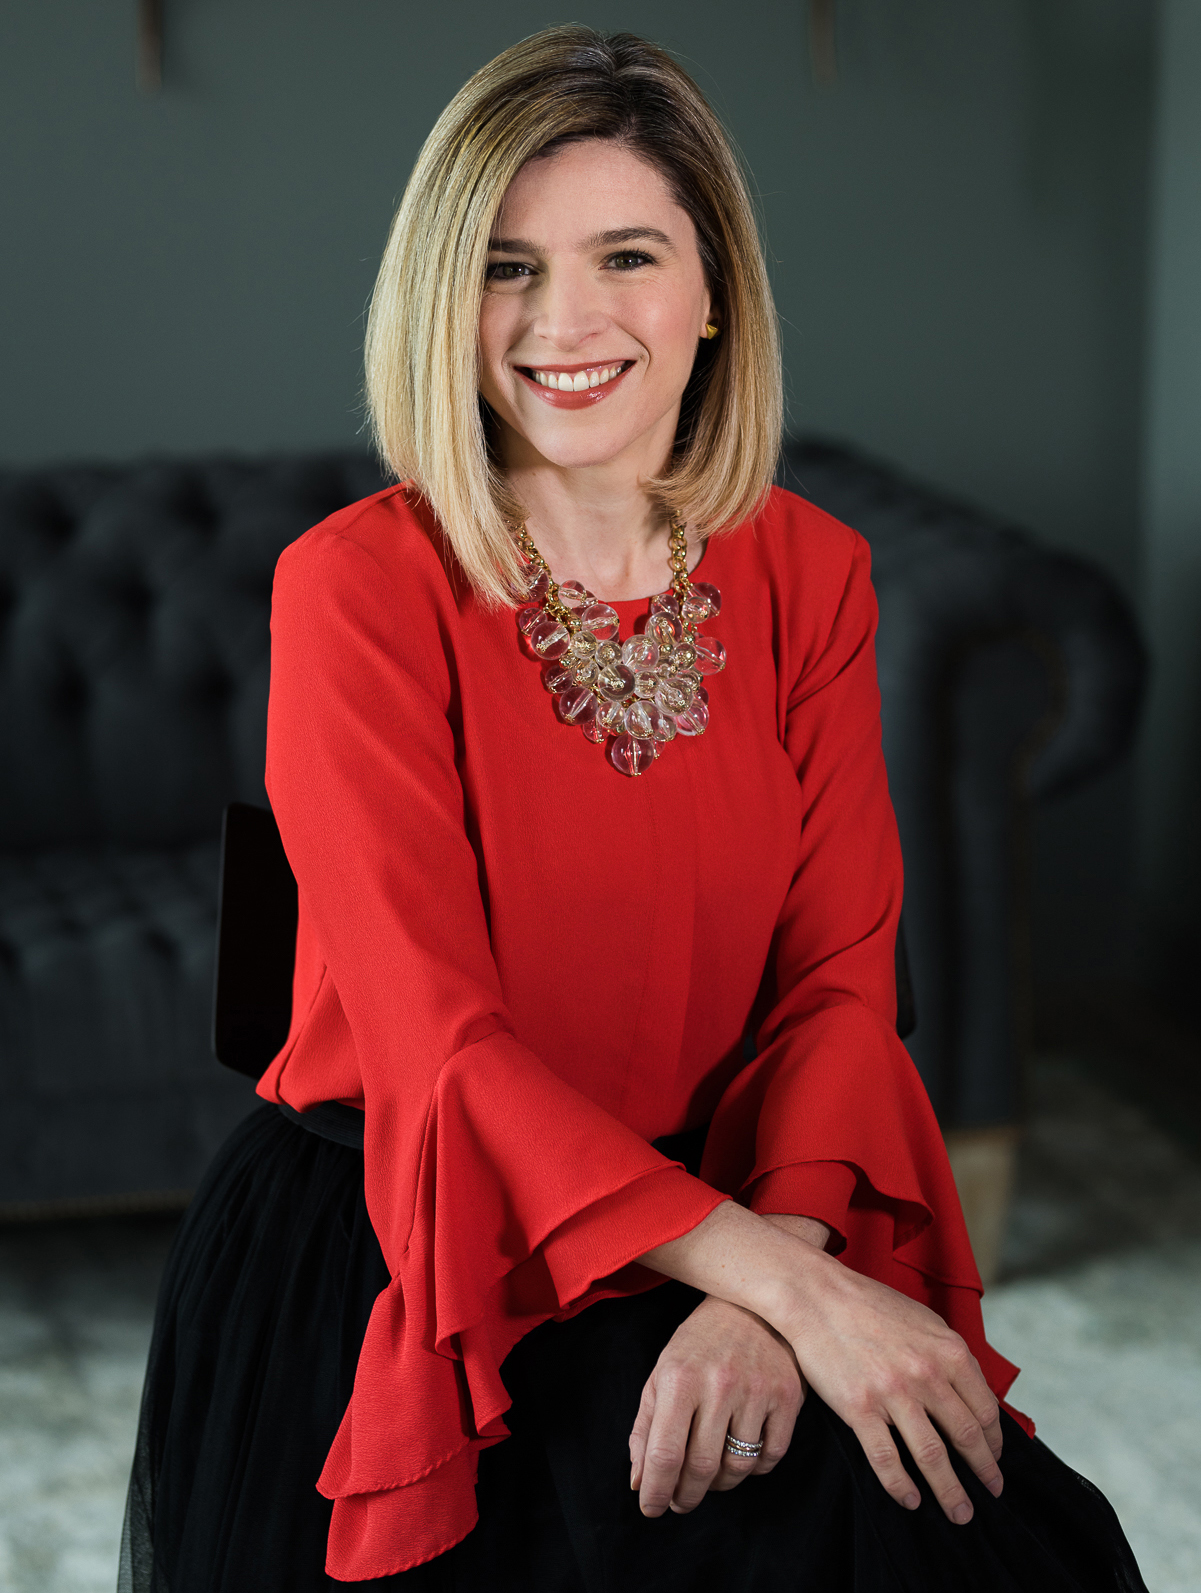 Meet the Designer: Natalie Walsh